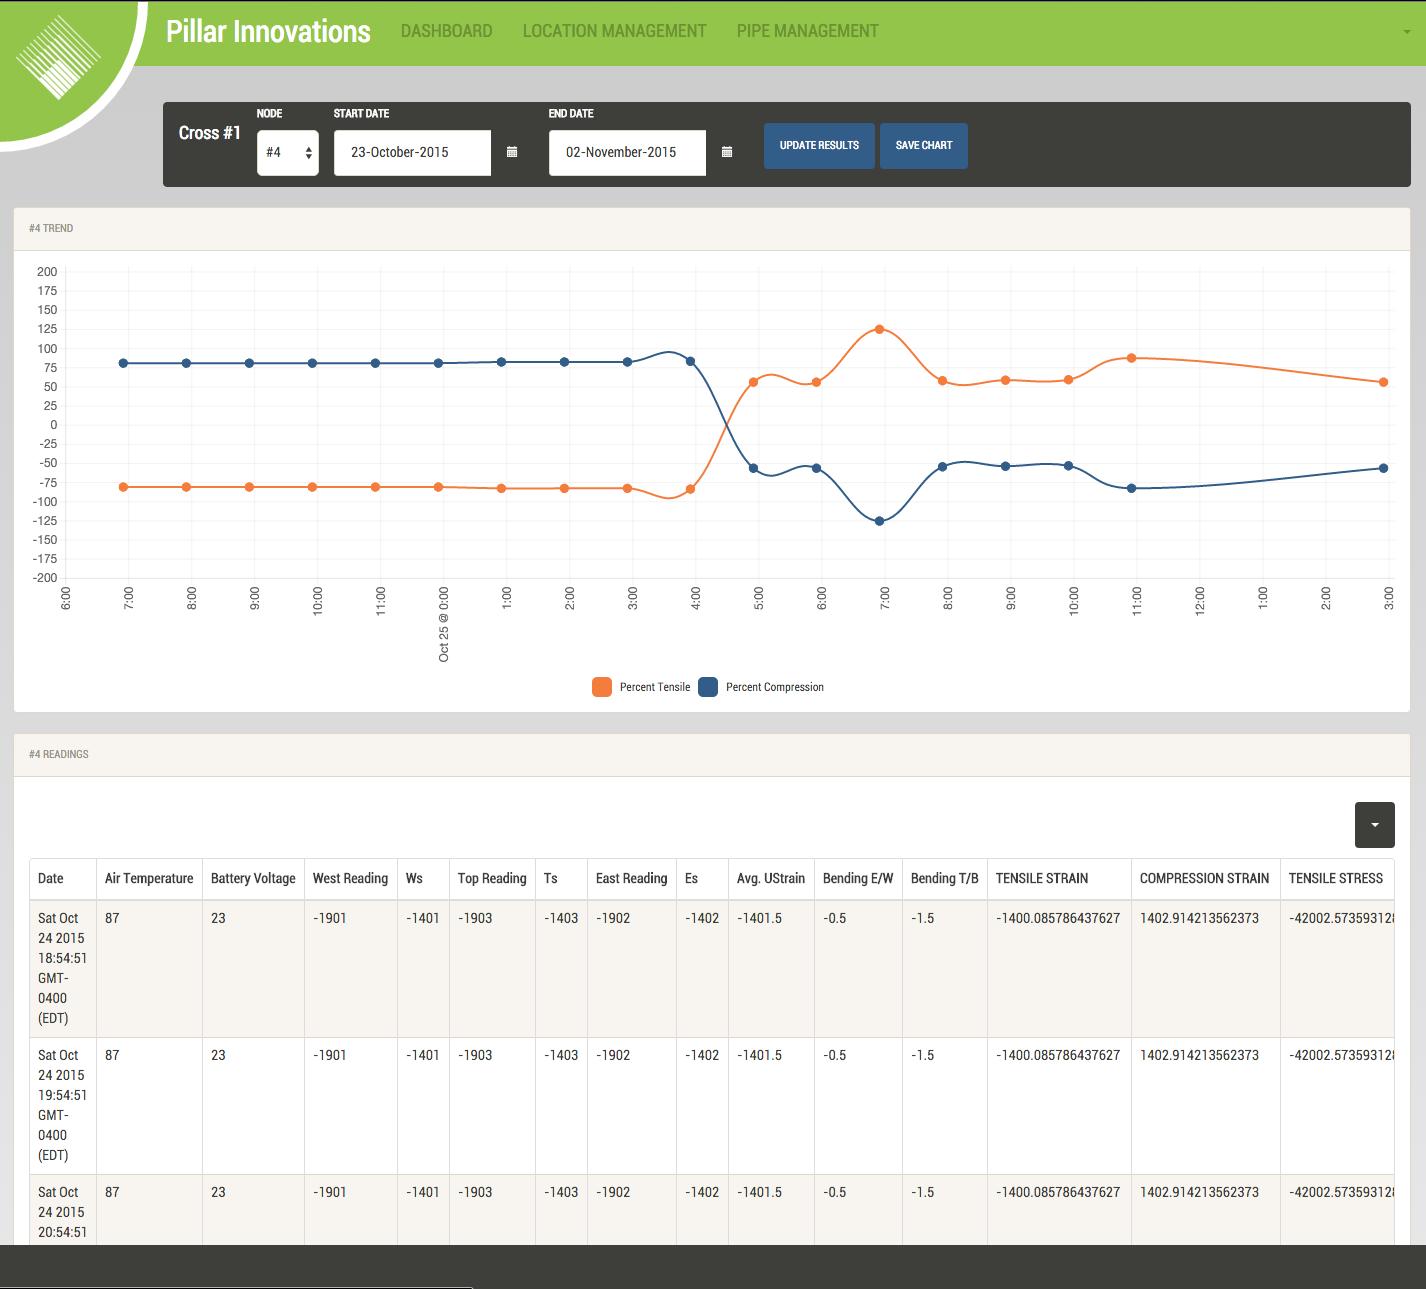 Strain Gauge Monitoring System Image